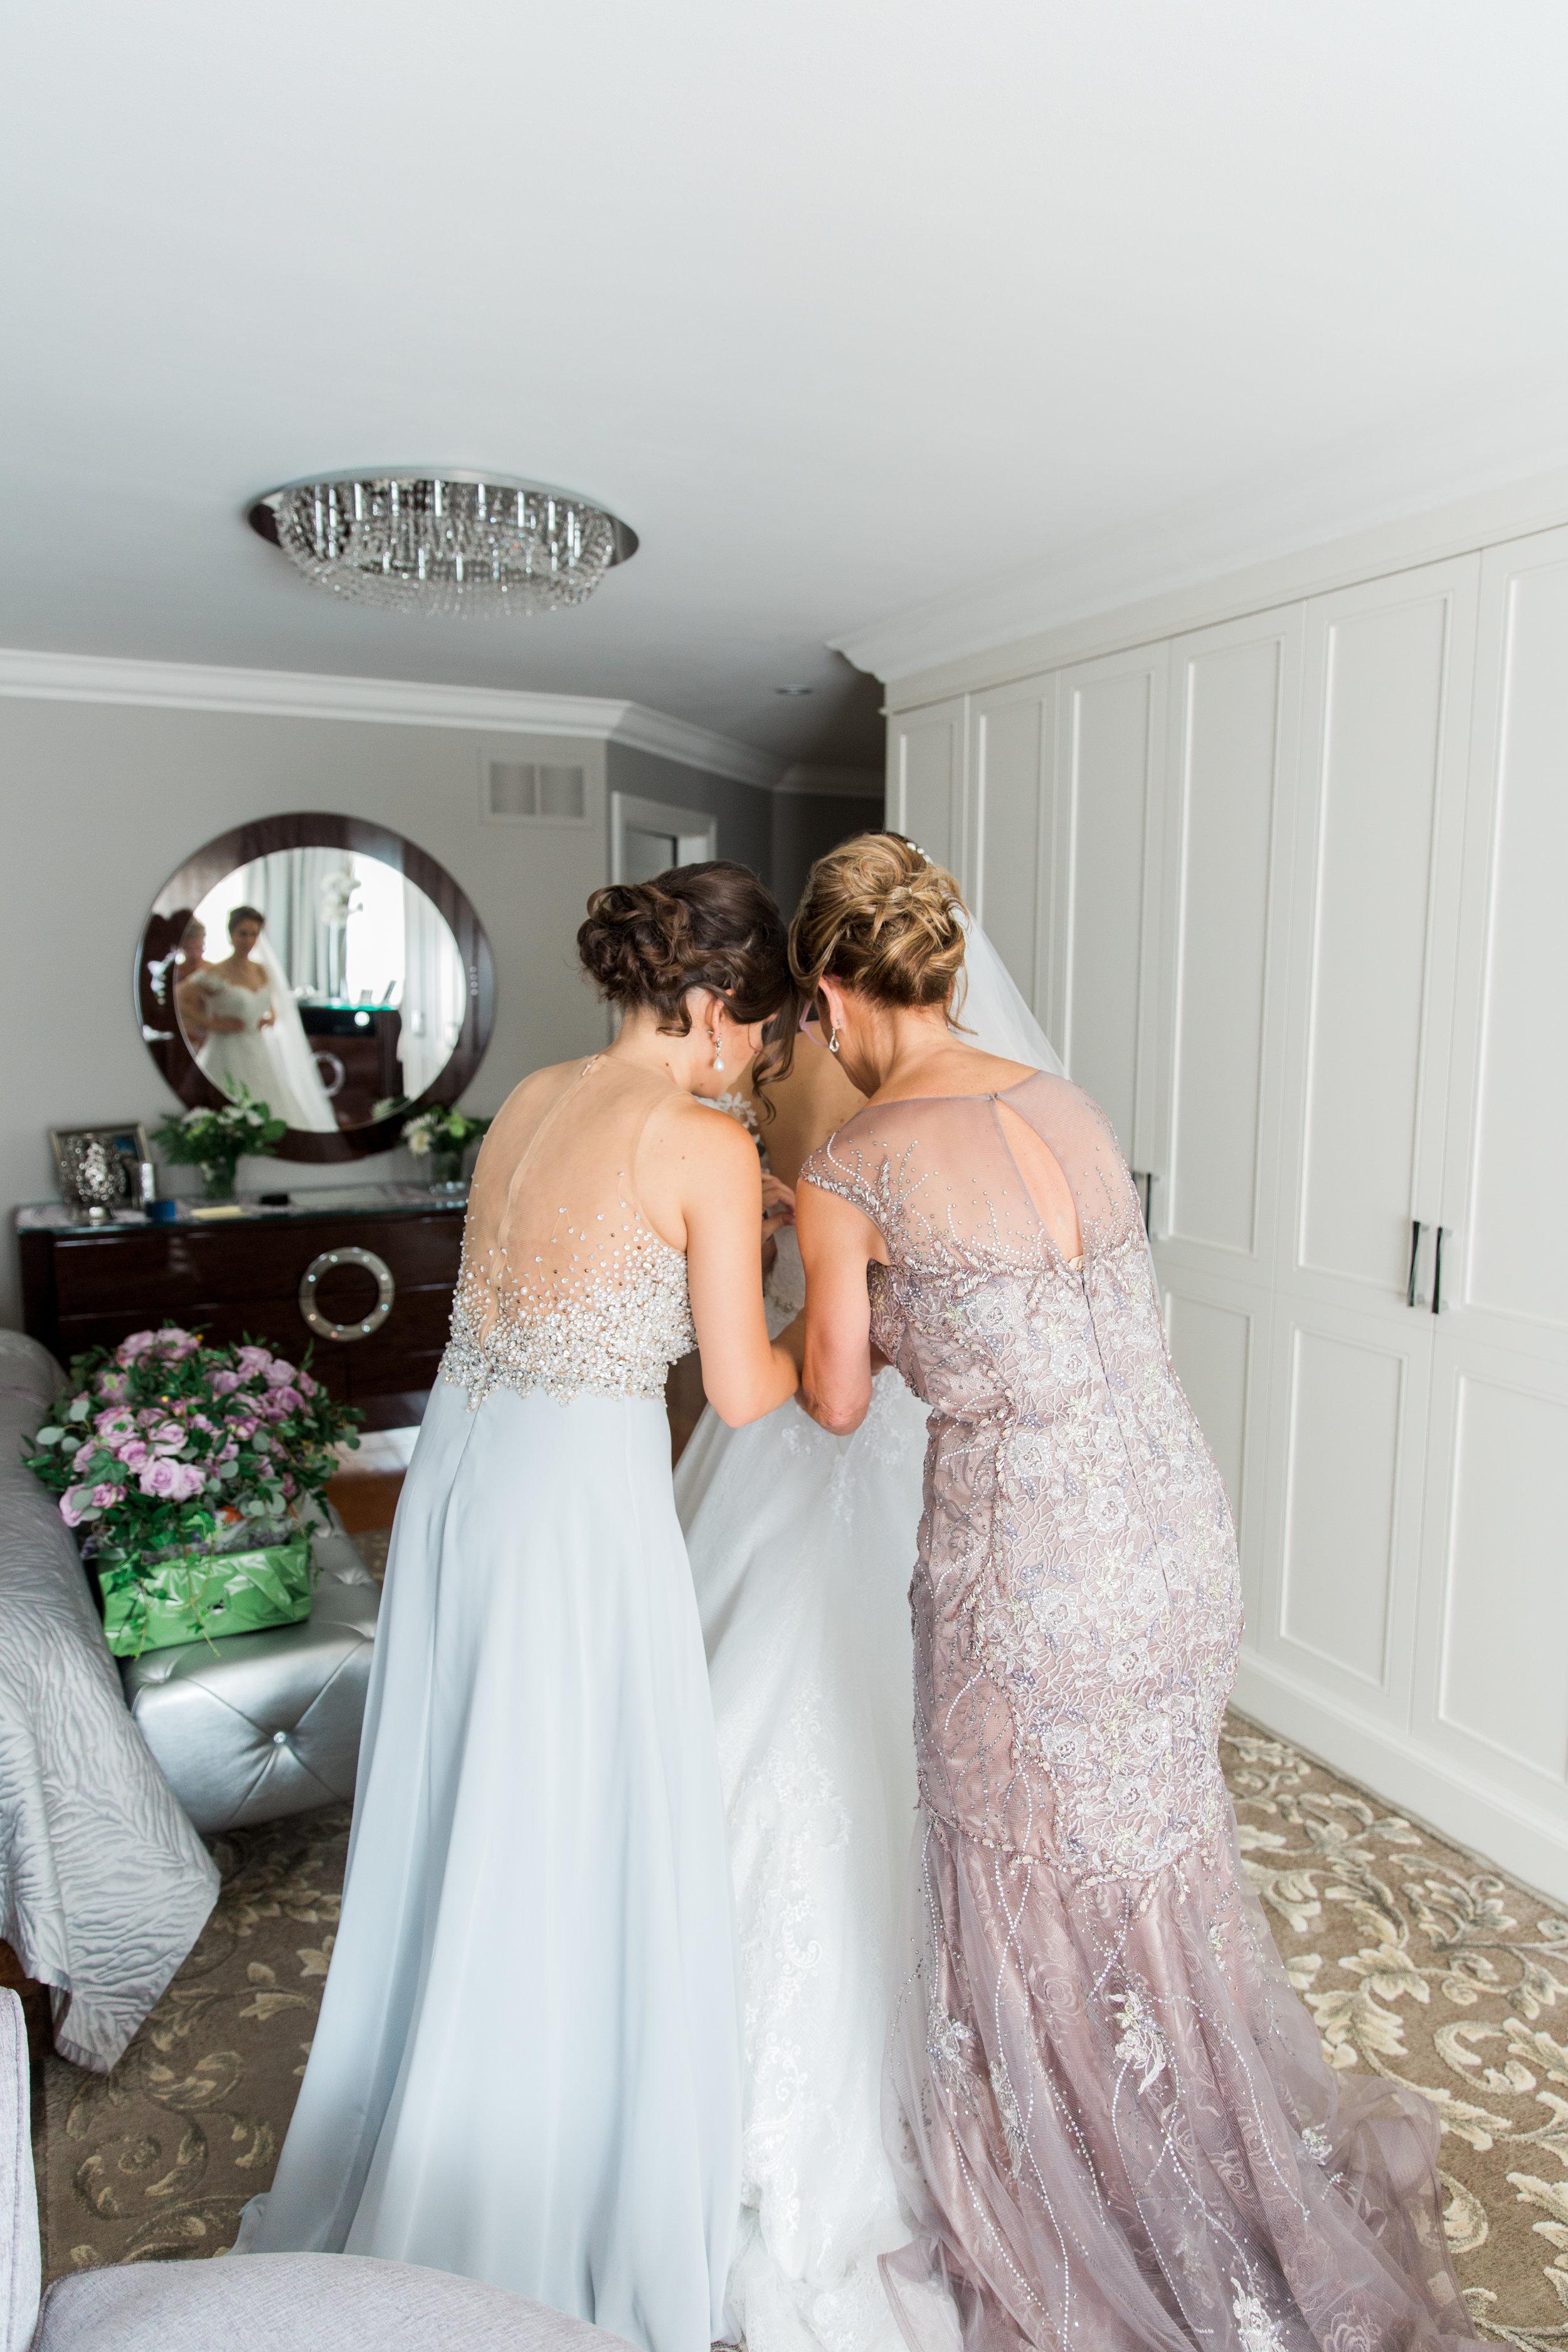 Danielle-Giroux-Amir-Golbazi-Toronto-Wedding-Photographer-Bellvue-Manor_DeLuca_1-136.jpg